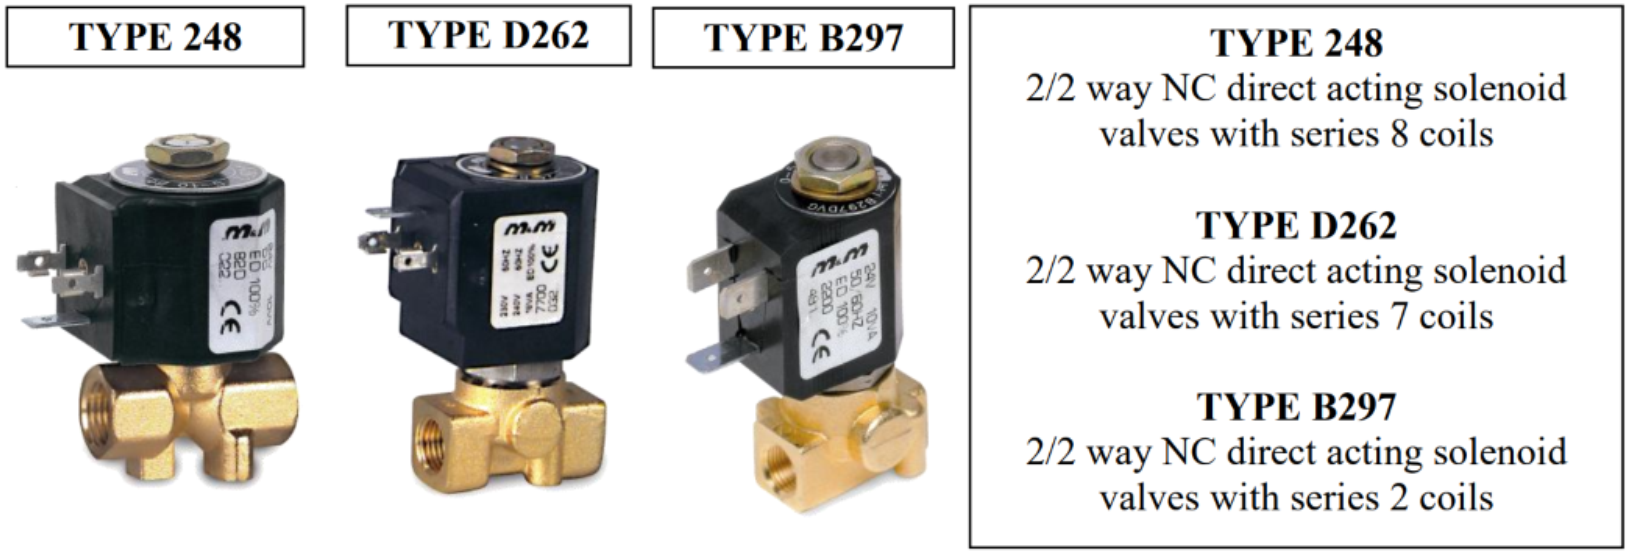 solenoid valves in foam markers; solenoid valves used